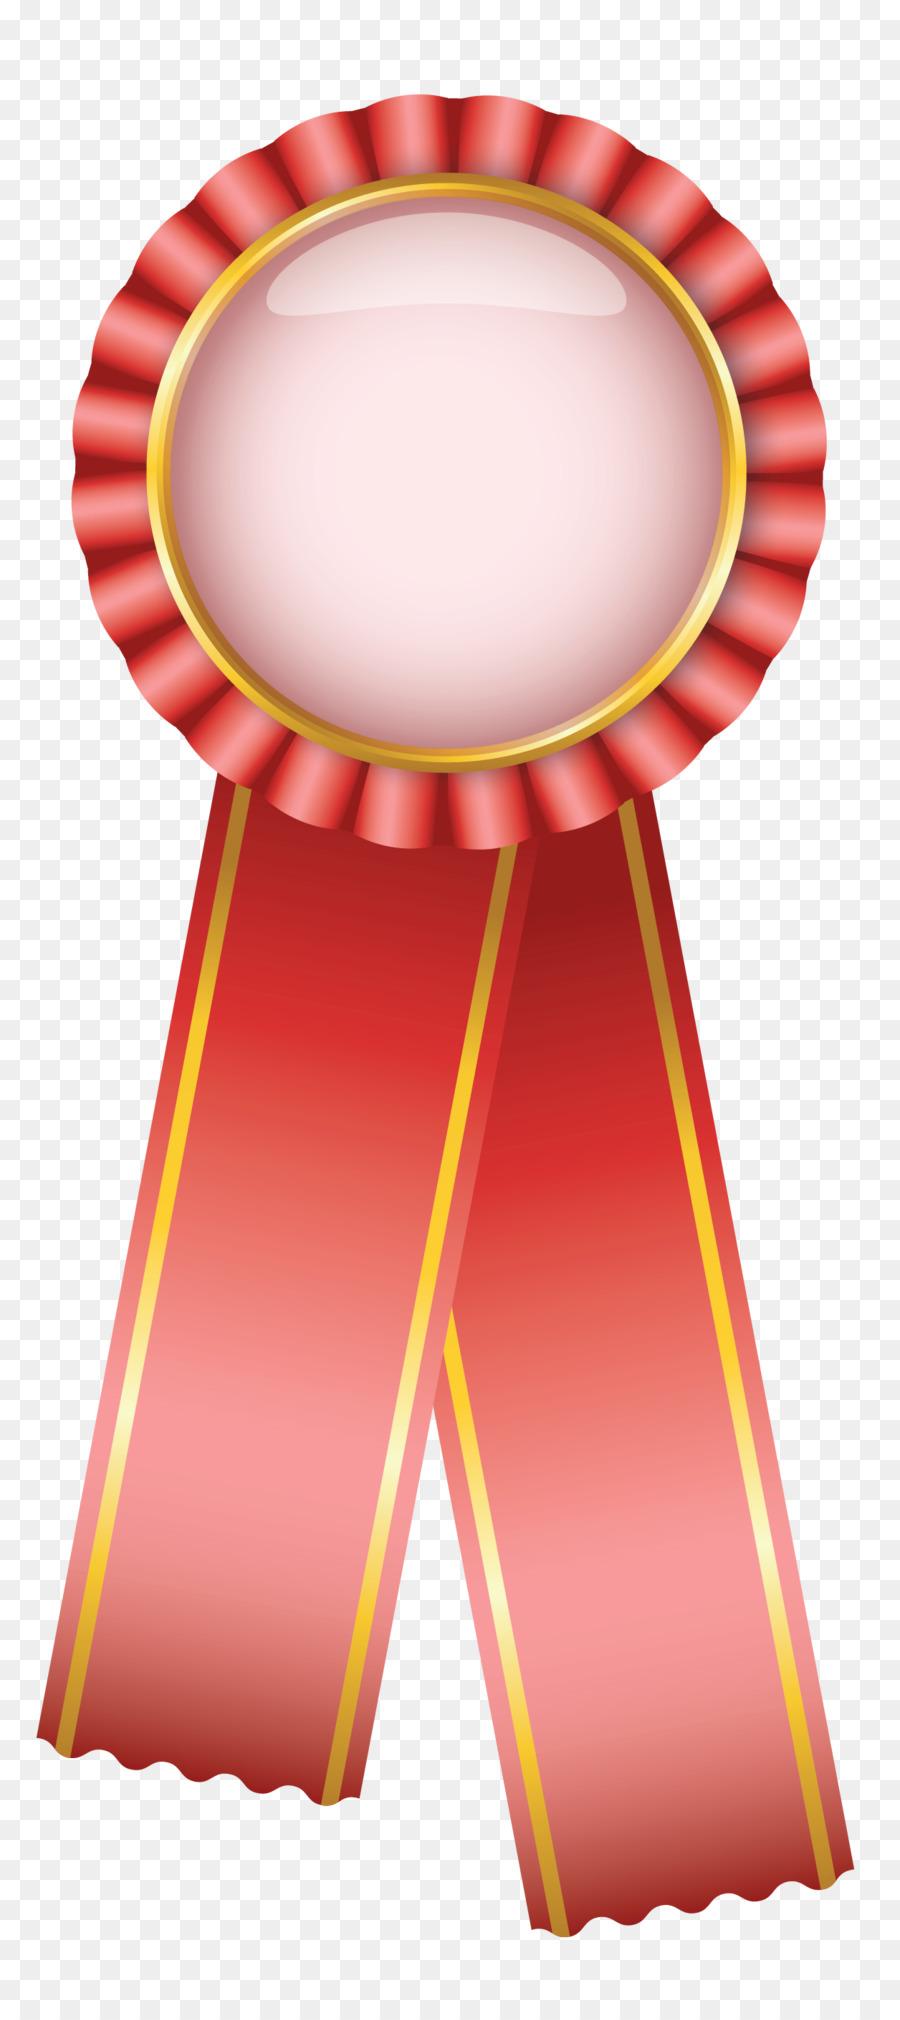 Award Ribbon Paper Clip art.